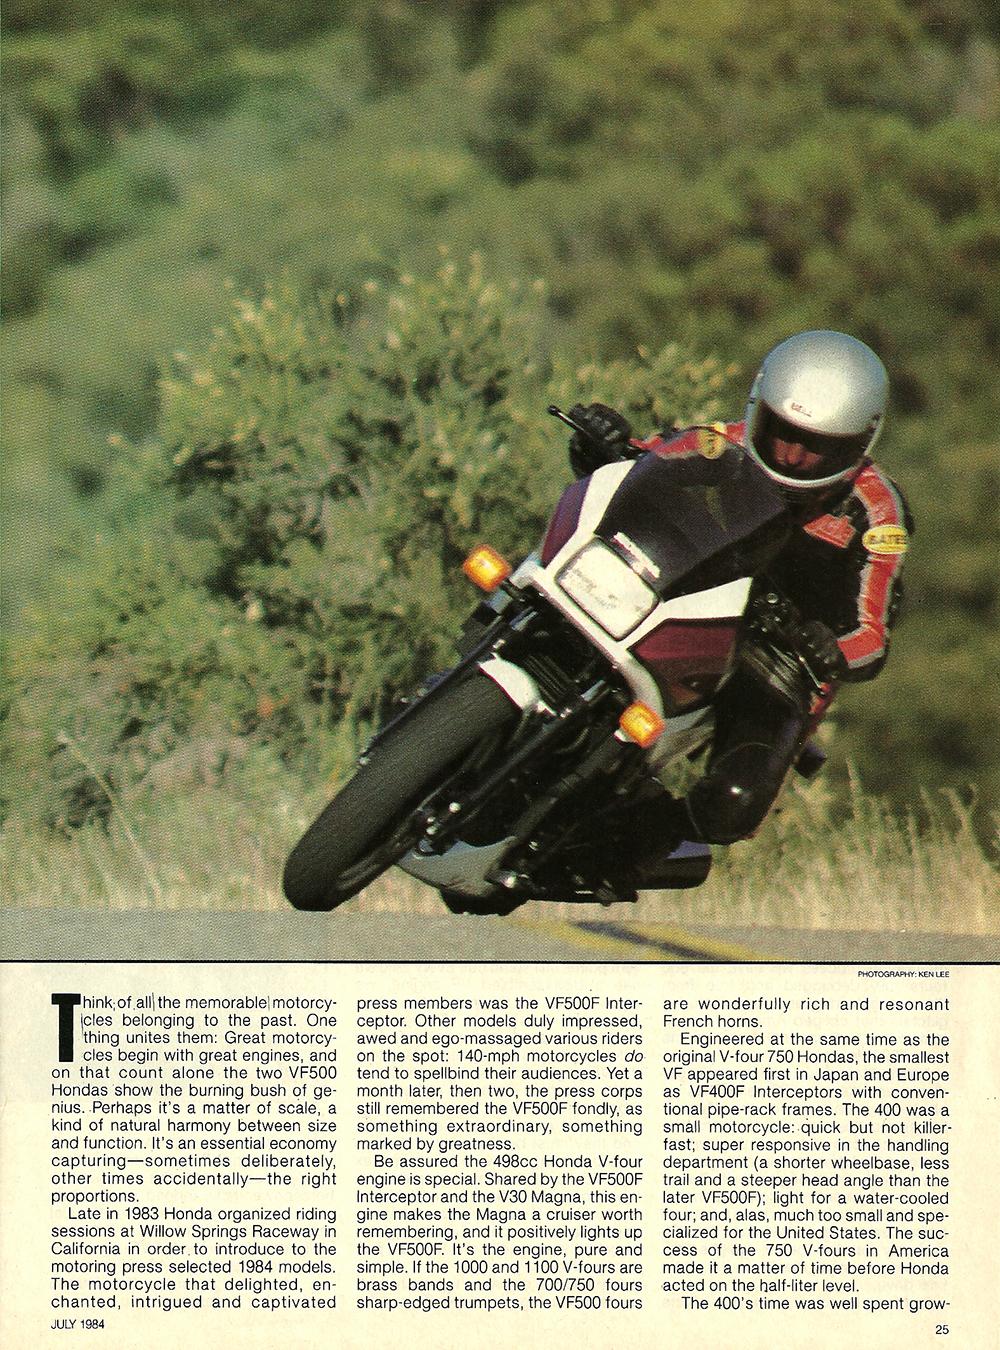 1984 Honda V30 Magna and VF500F Interceptor road test 02.jpg